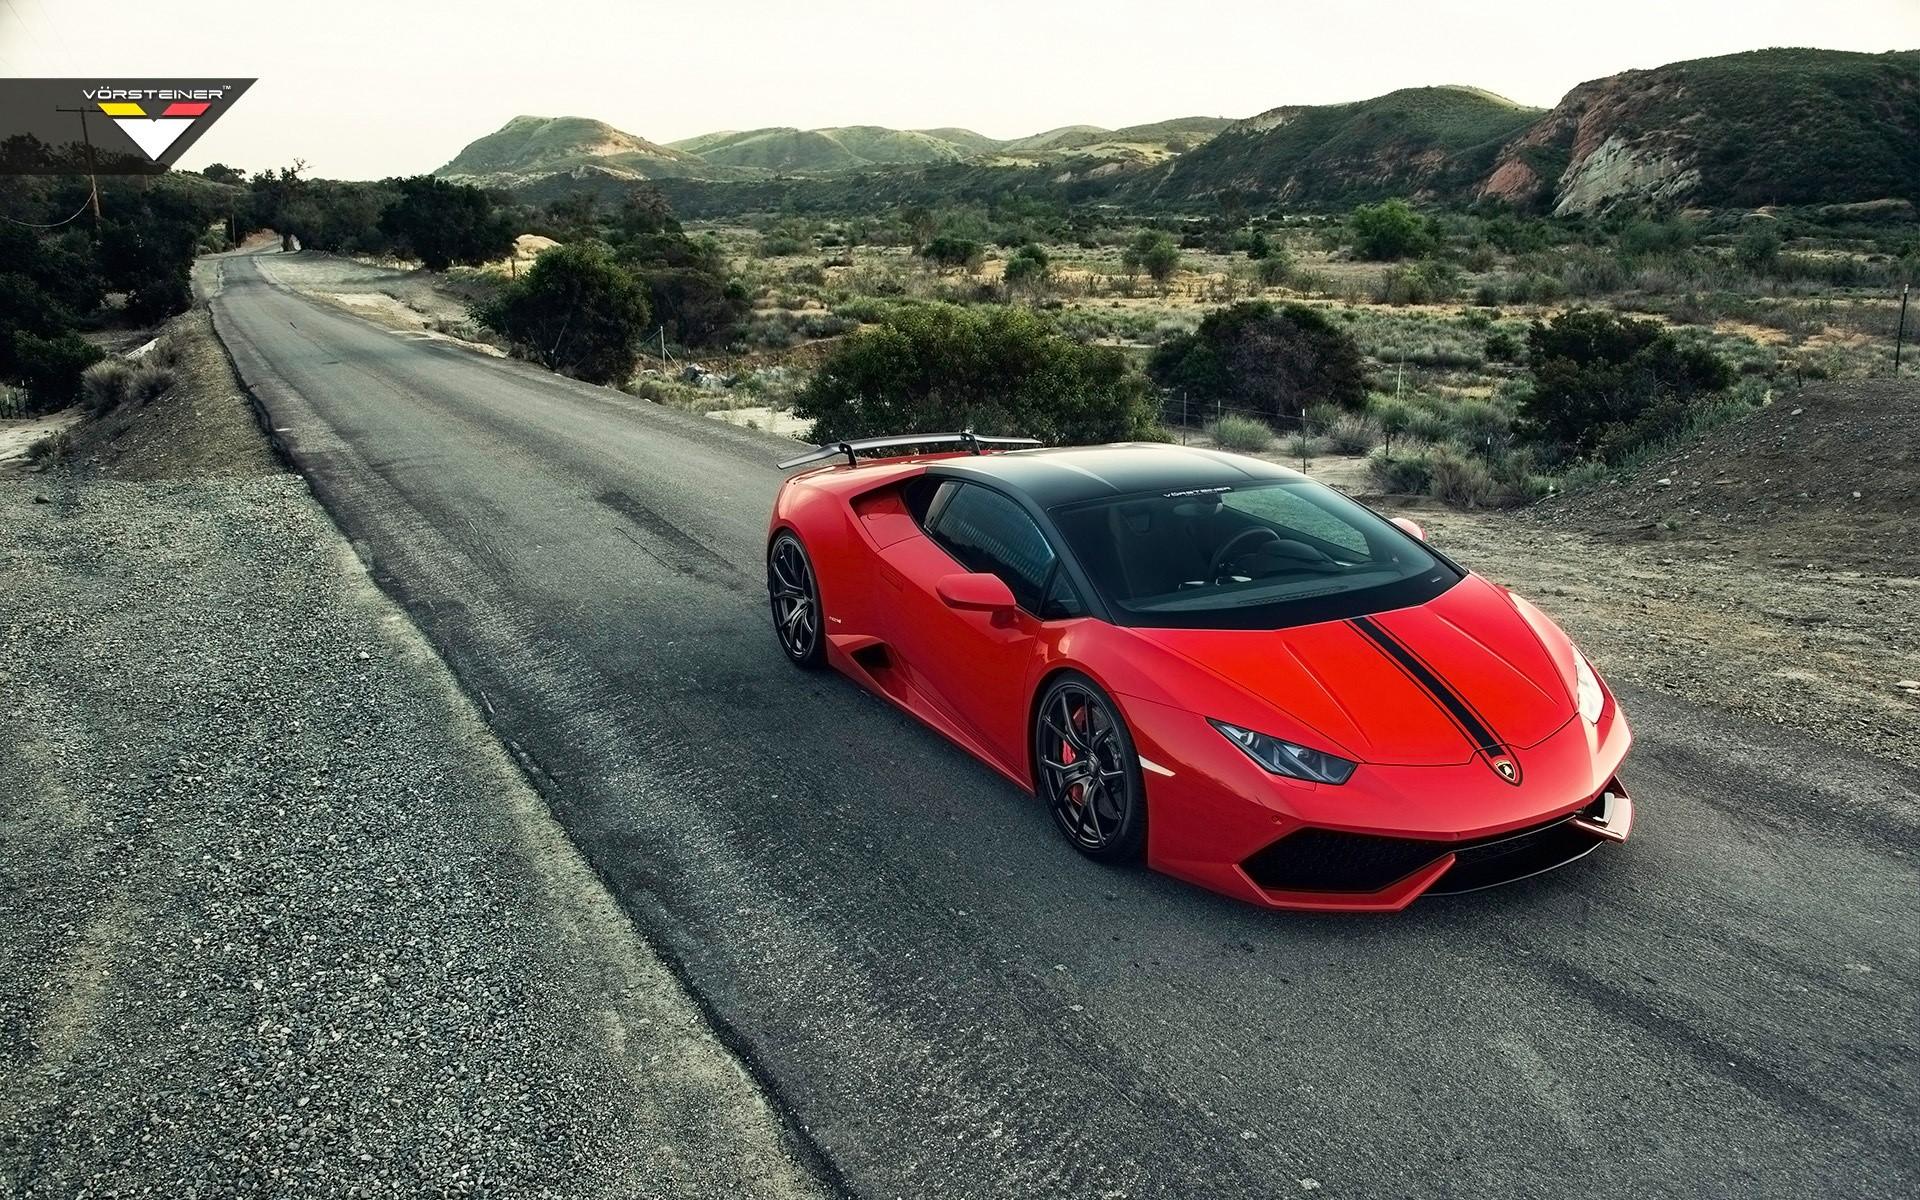 Fondos de pantalla Vorsteiner Lamborghini Huracan Verona Edizione